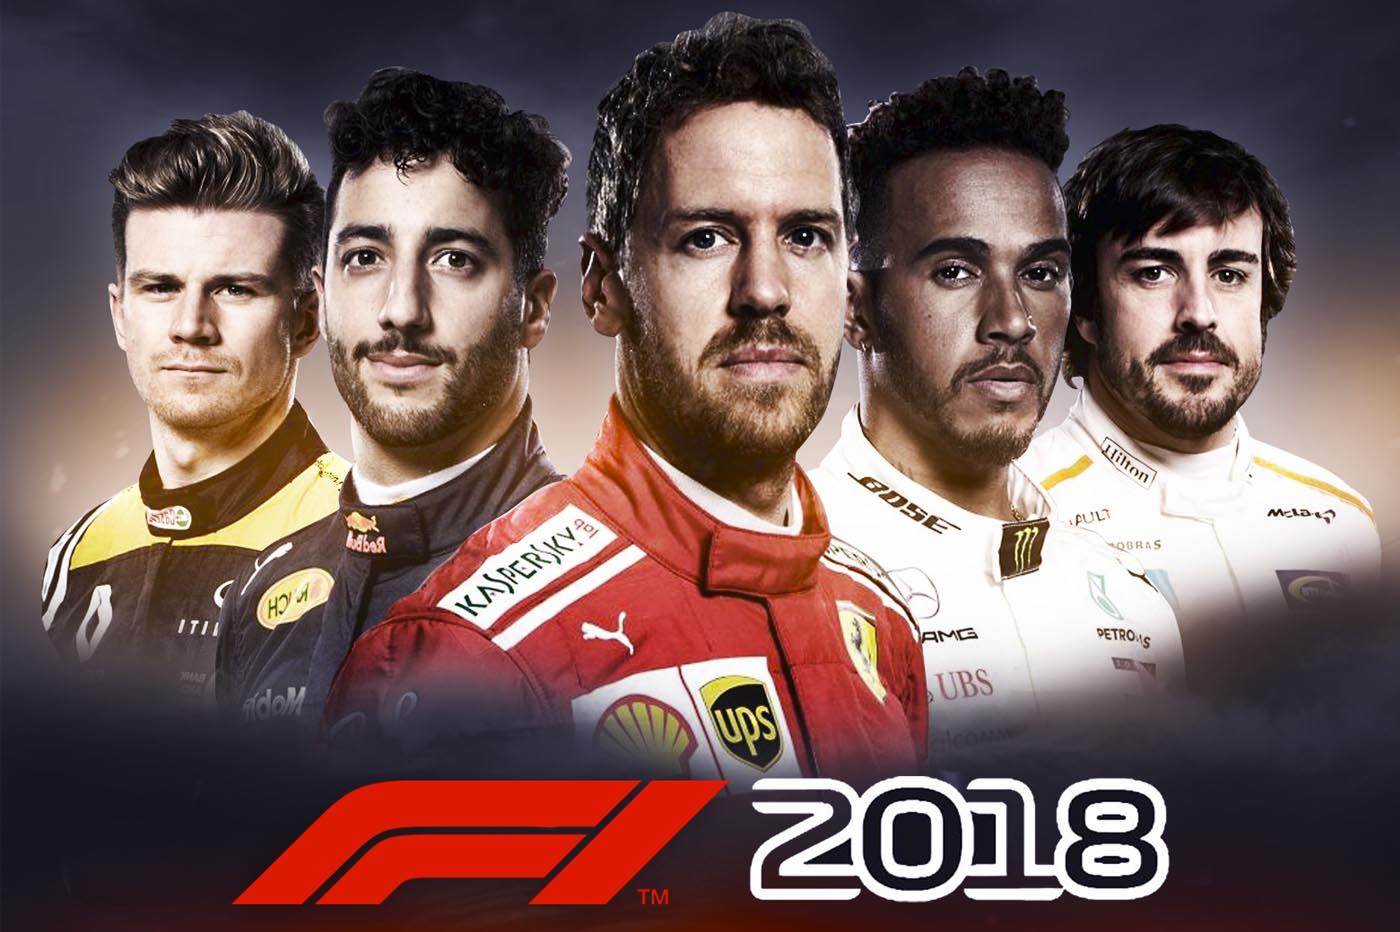 Analisis F1 2018 PS4